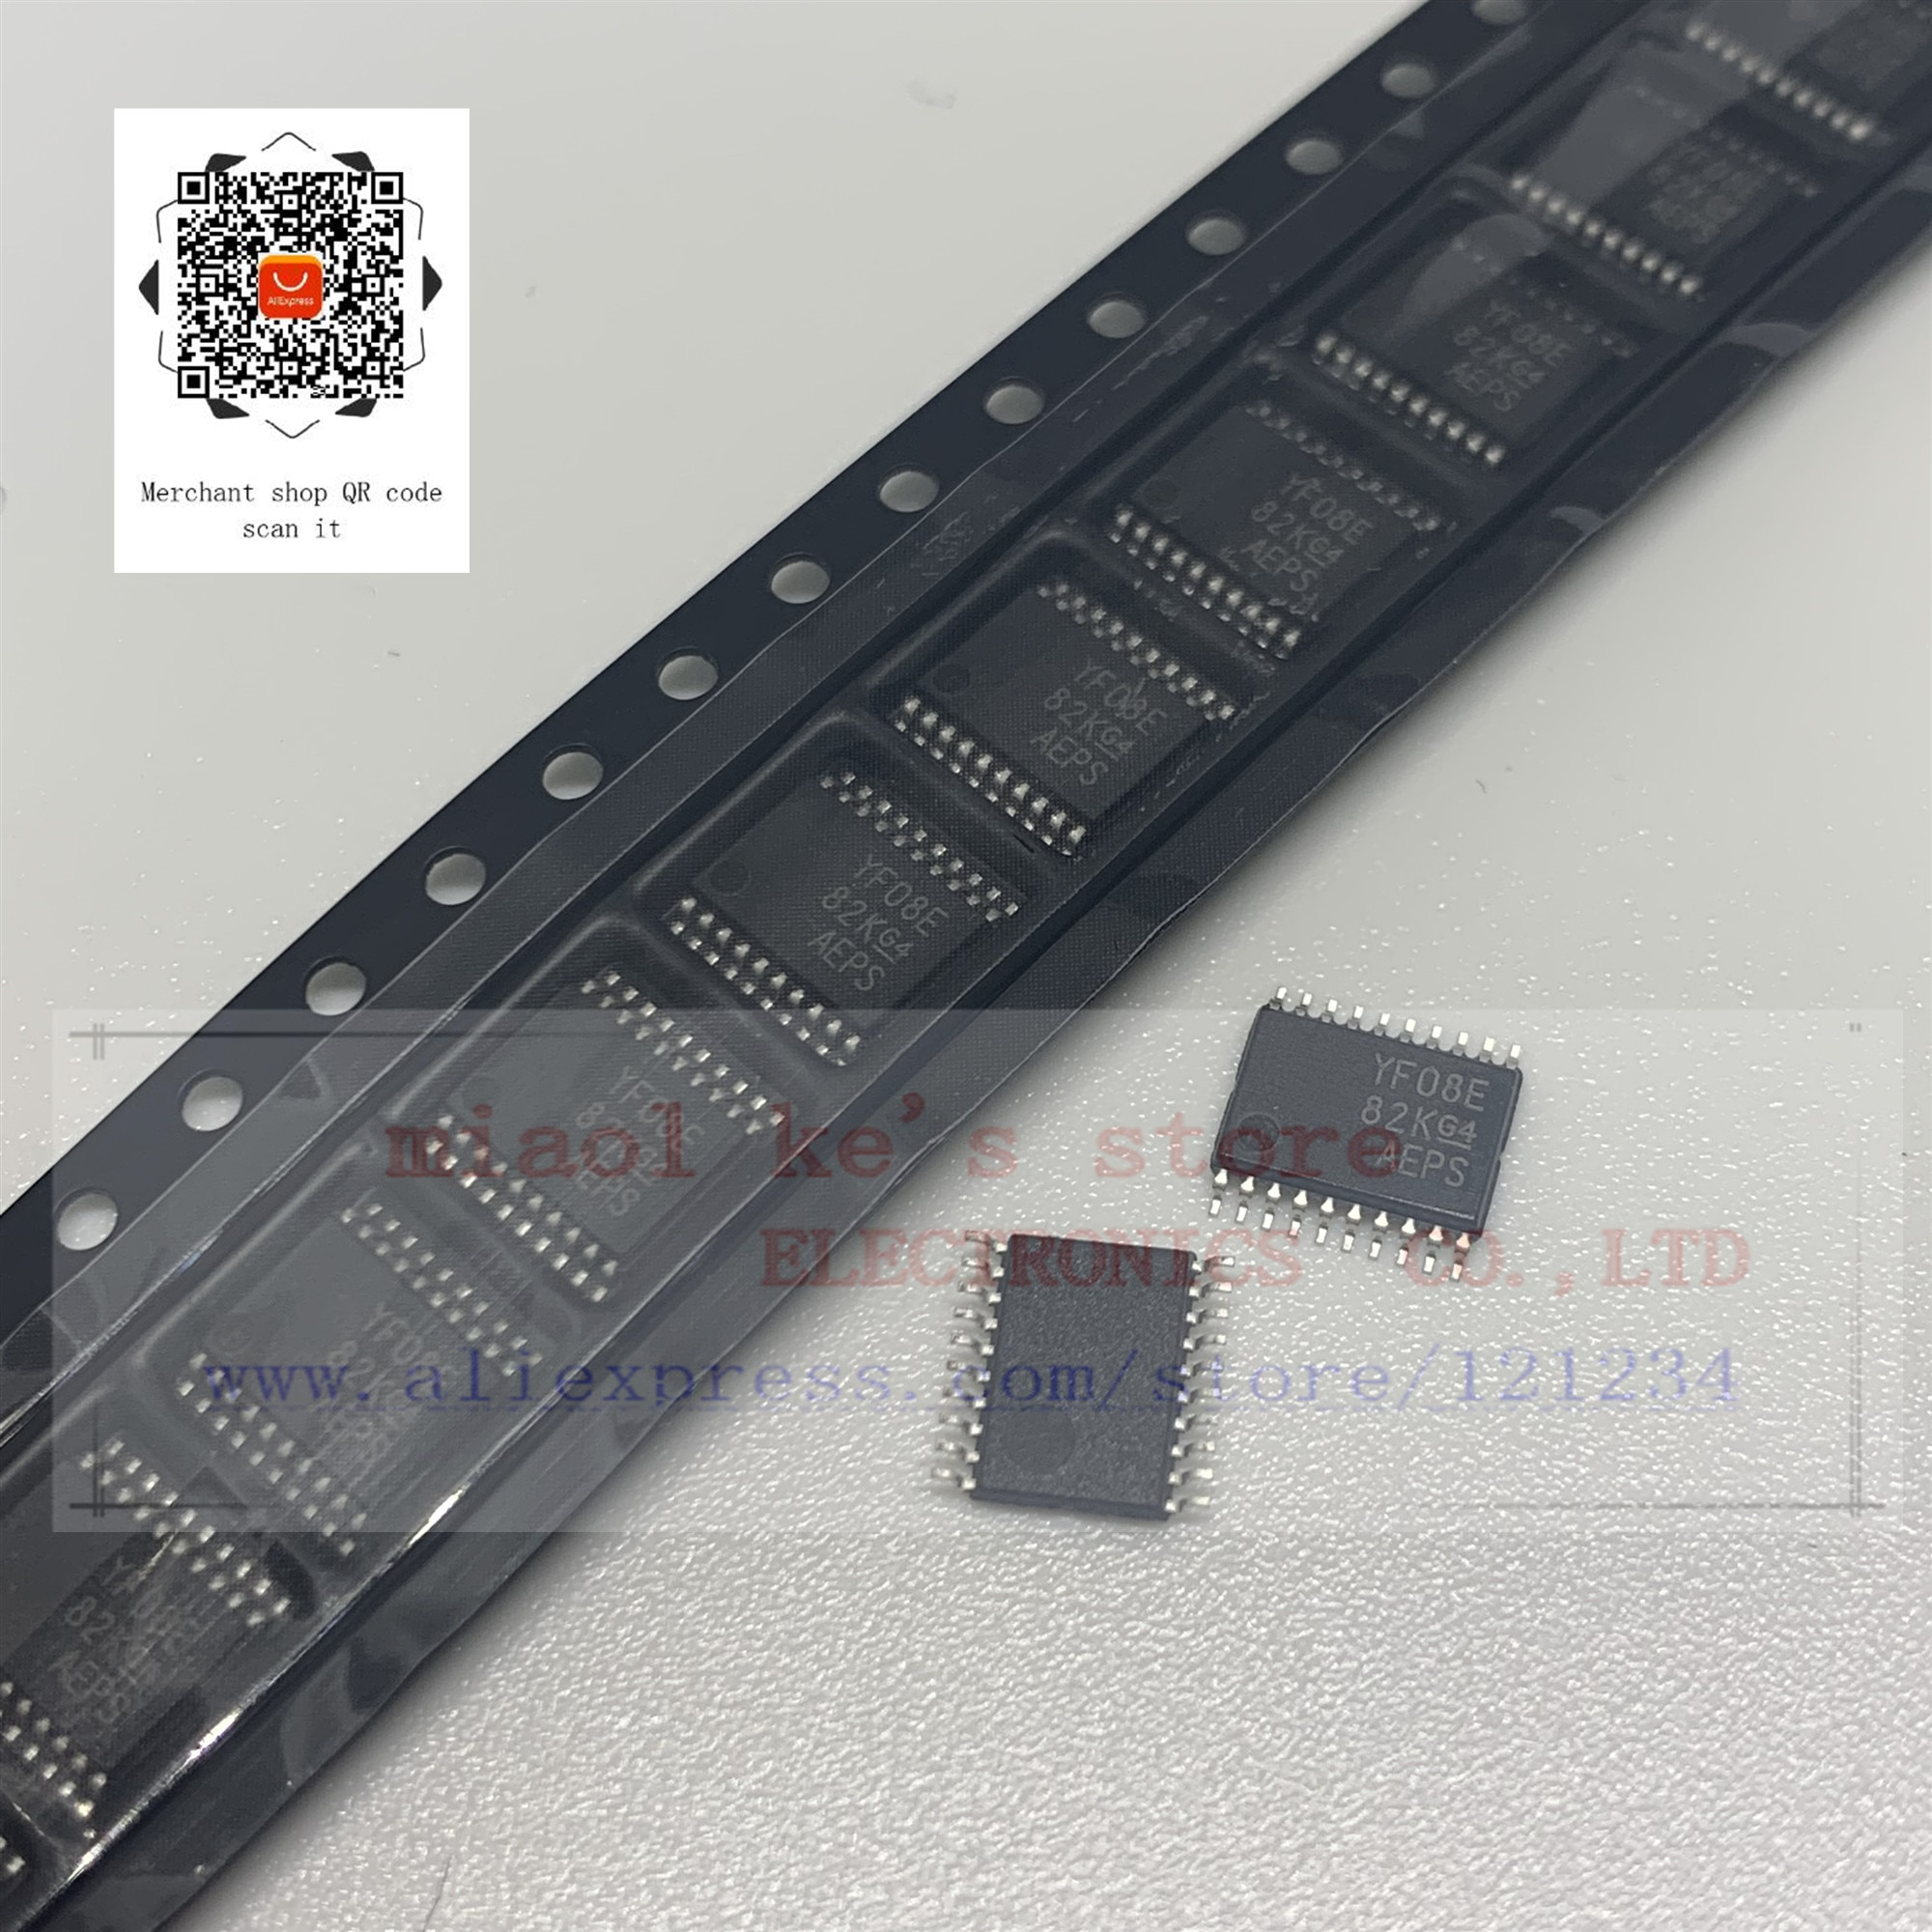 [5 шт ~ 10 шт] 100% Новый оригинал: TXS0108EPWRG4 TXS0108EPWR TXS0108EPW TXS0108E TXS0108 YF08E YE08-IC TRNSLTR двунаправленный 20TSSOP